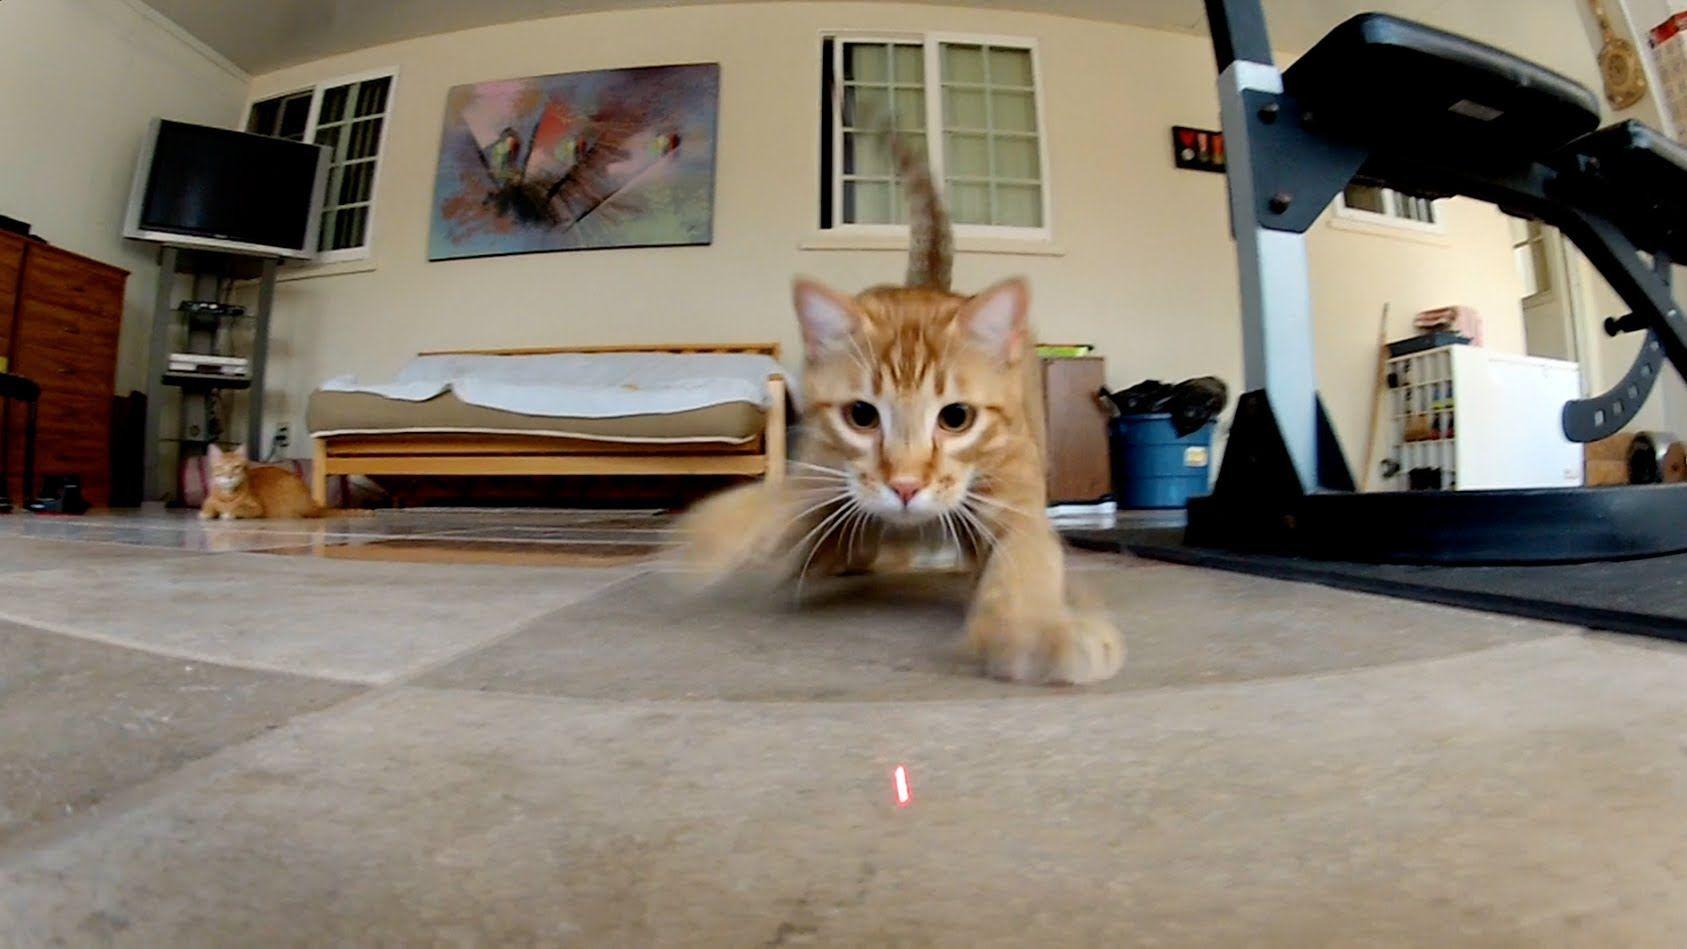 Kittens Vs. Laser Battle Of Cuteness Kittens, Cats